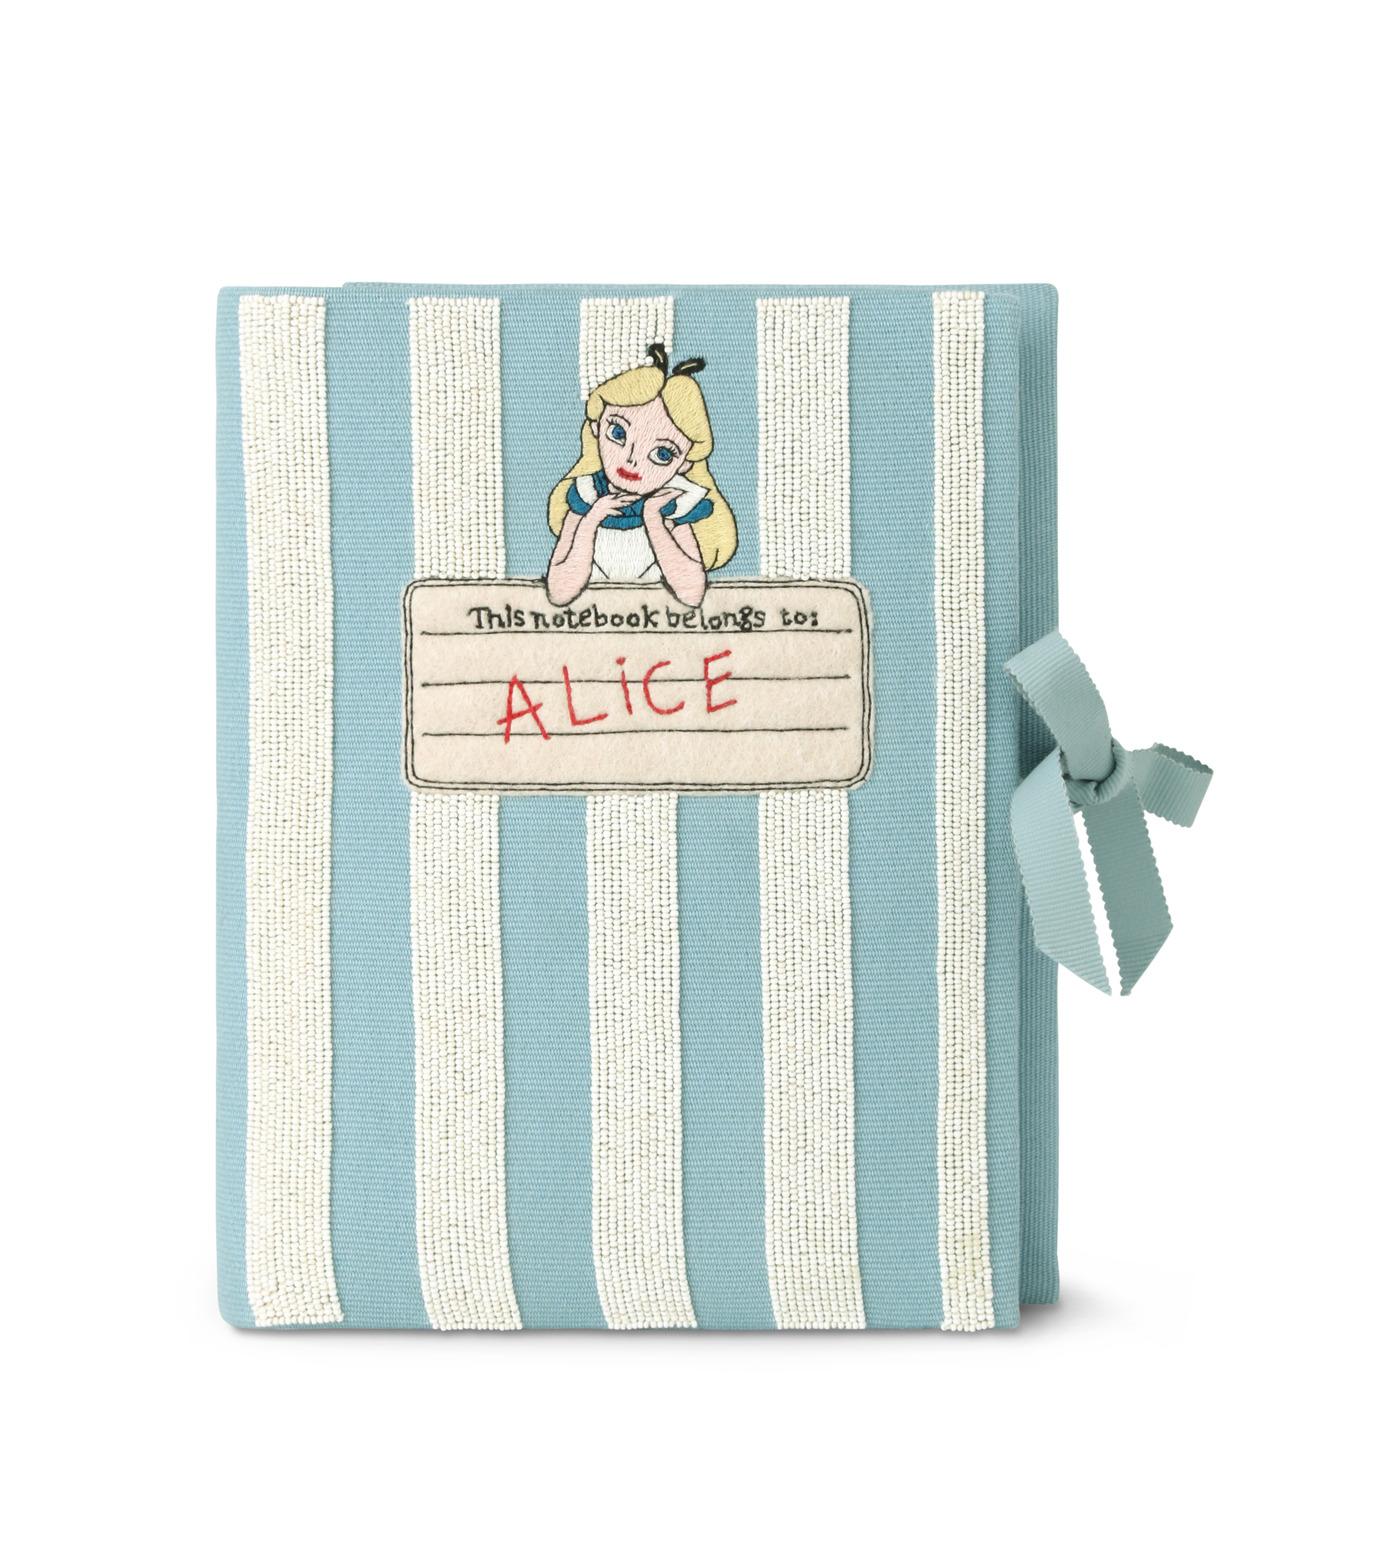 Olympia Le-Tan(オリンピア ルタン)のNotebook Clutch Alice-LIGHT BLUE(クラッチバッグ/clutch bag)-RE16BN001-91 拡大詳細画像1